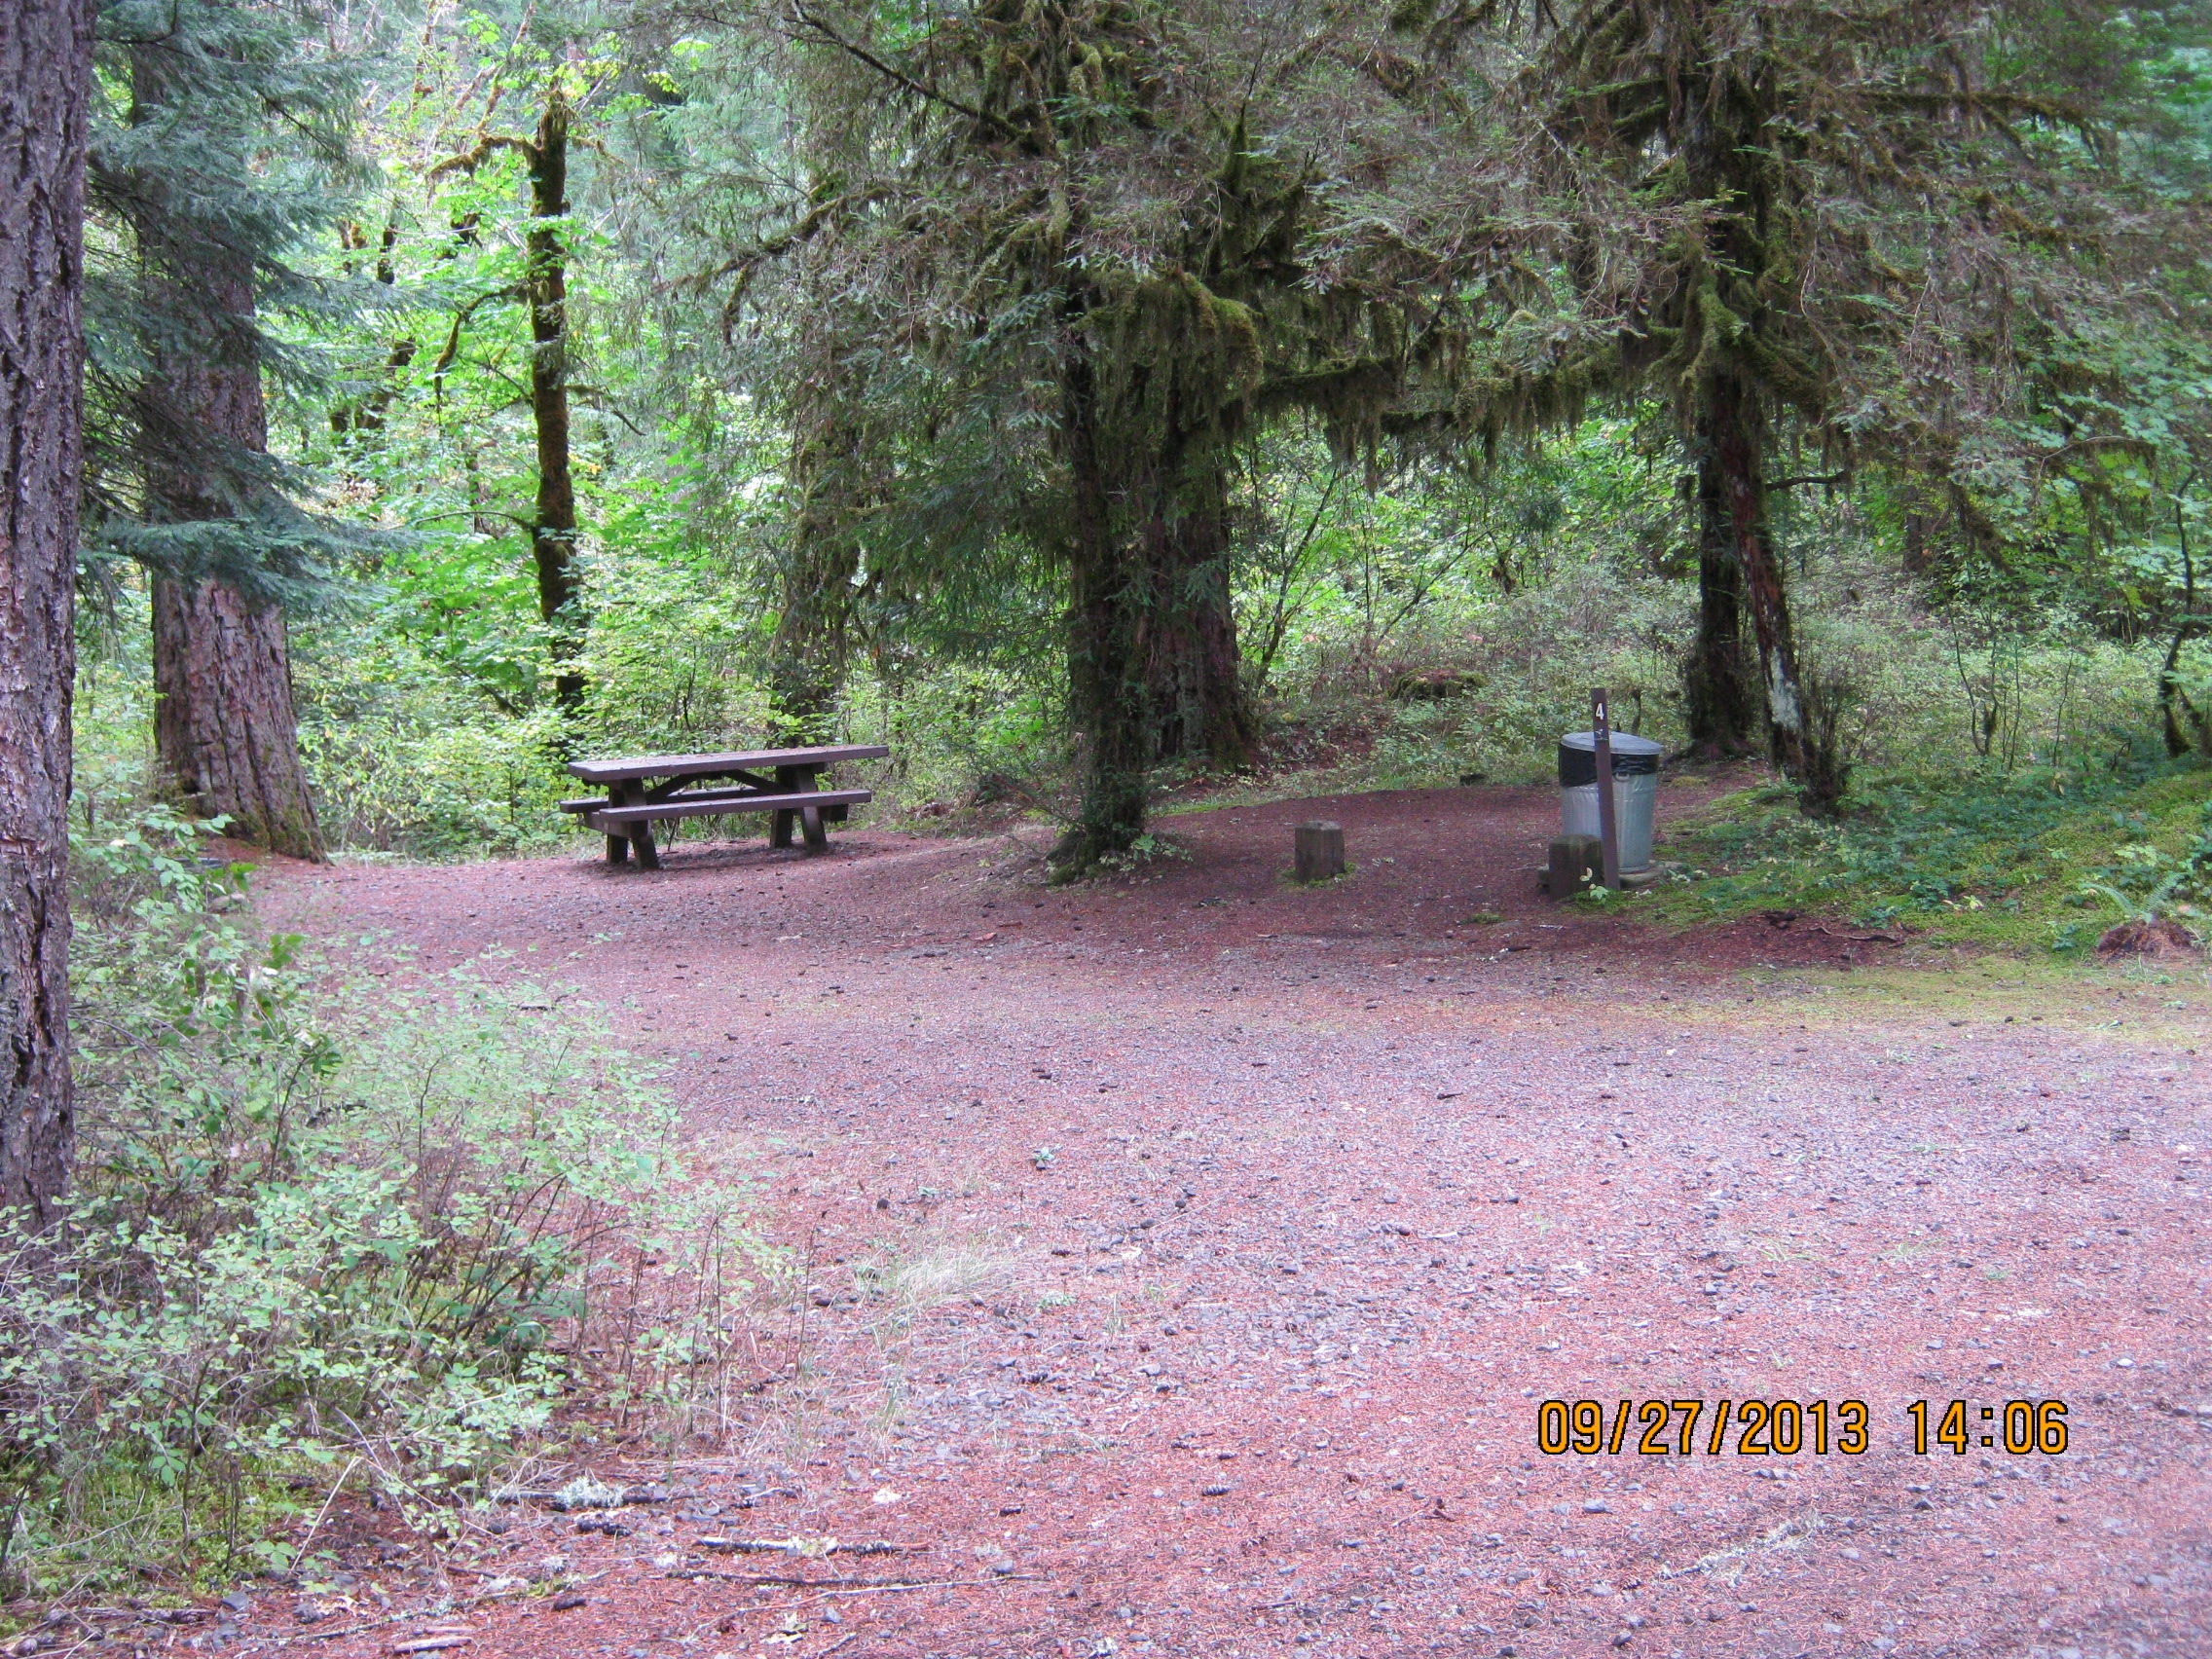 Cover Camp Tiller Umpqua National Forest